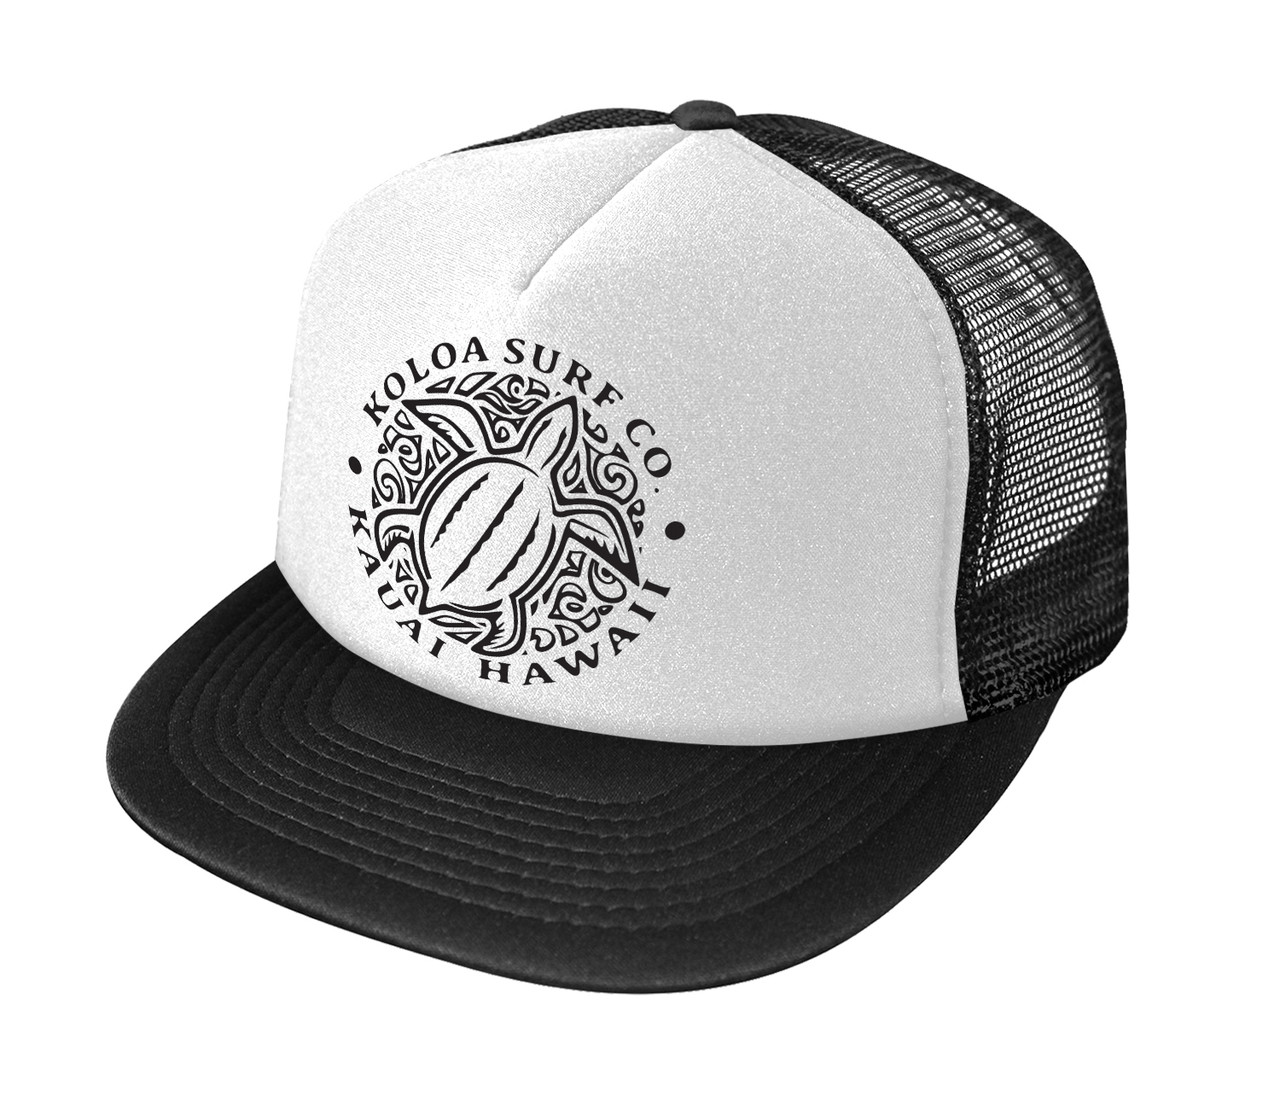 3c0fbd4ef3fac2 Koloa Surf Co. Hawaiian Turtle Honu Logo Mesh Back Trucker Hat ...